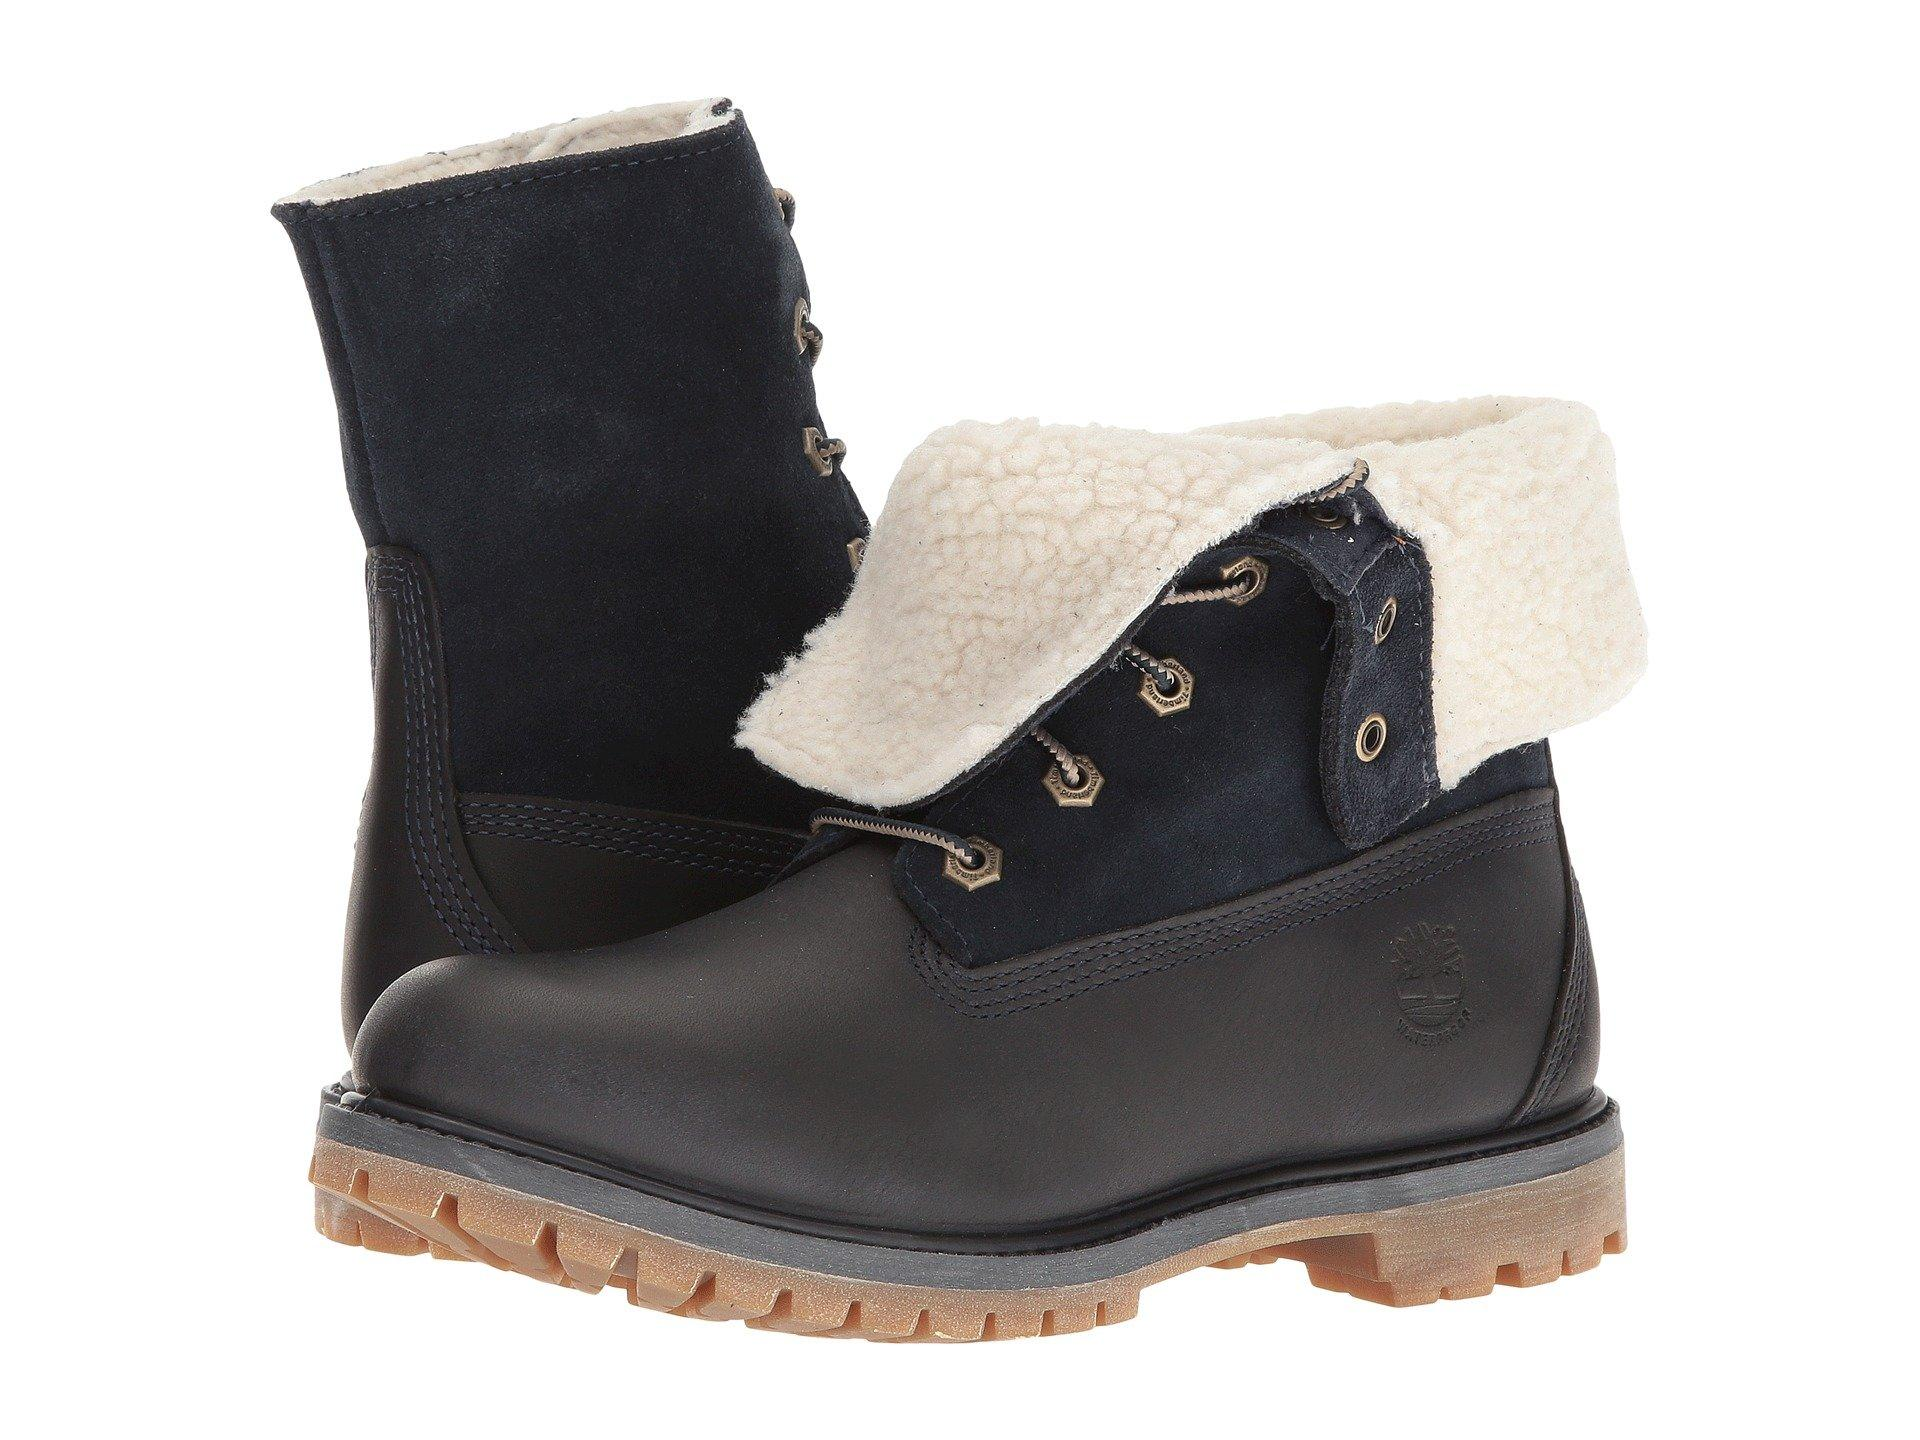 Authentics Teddy Fleece Waterproof Fold Down Boot in Black Iris